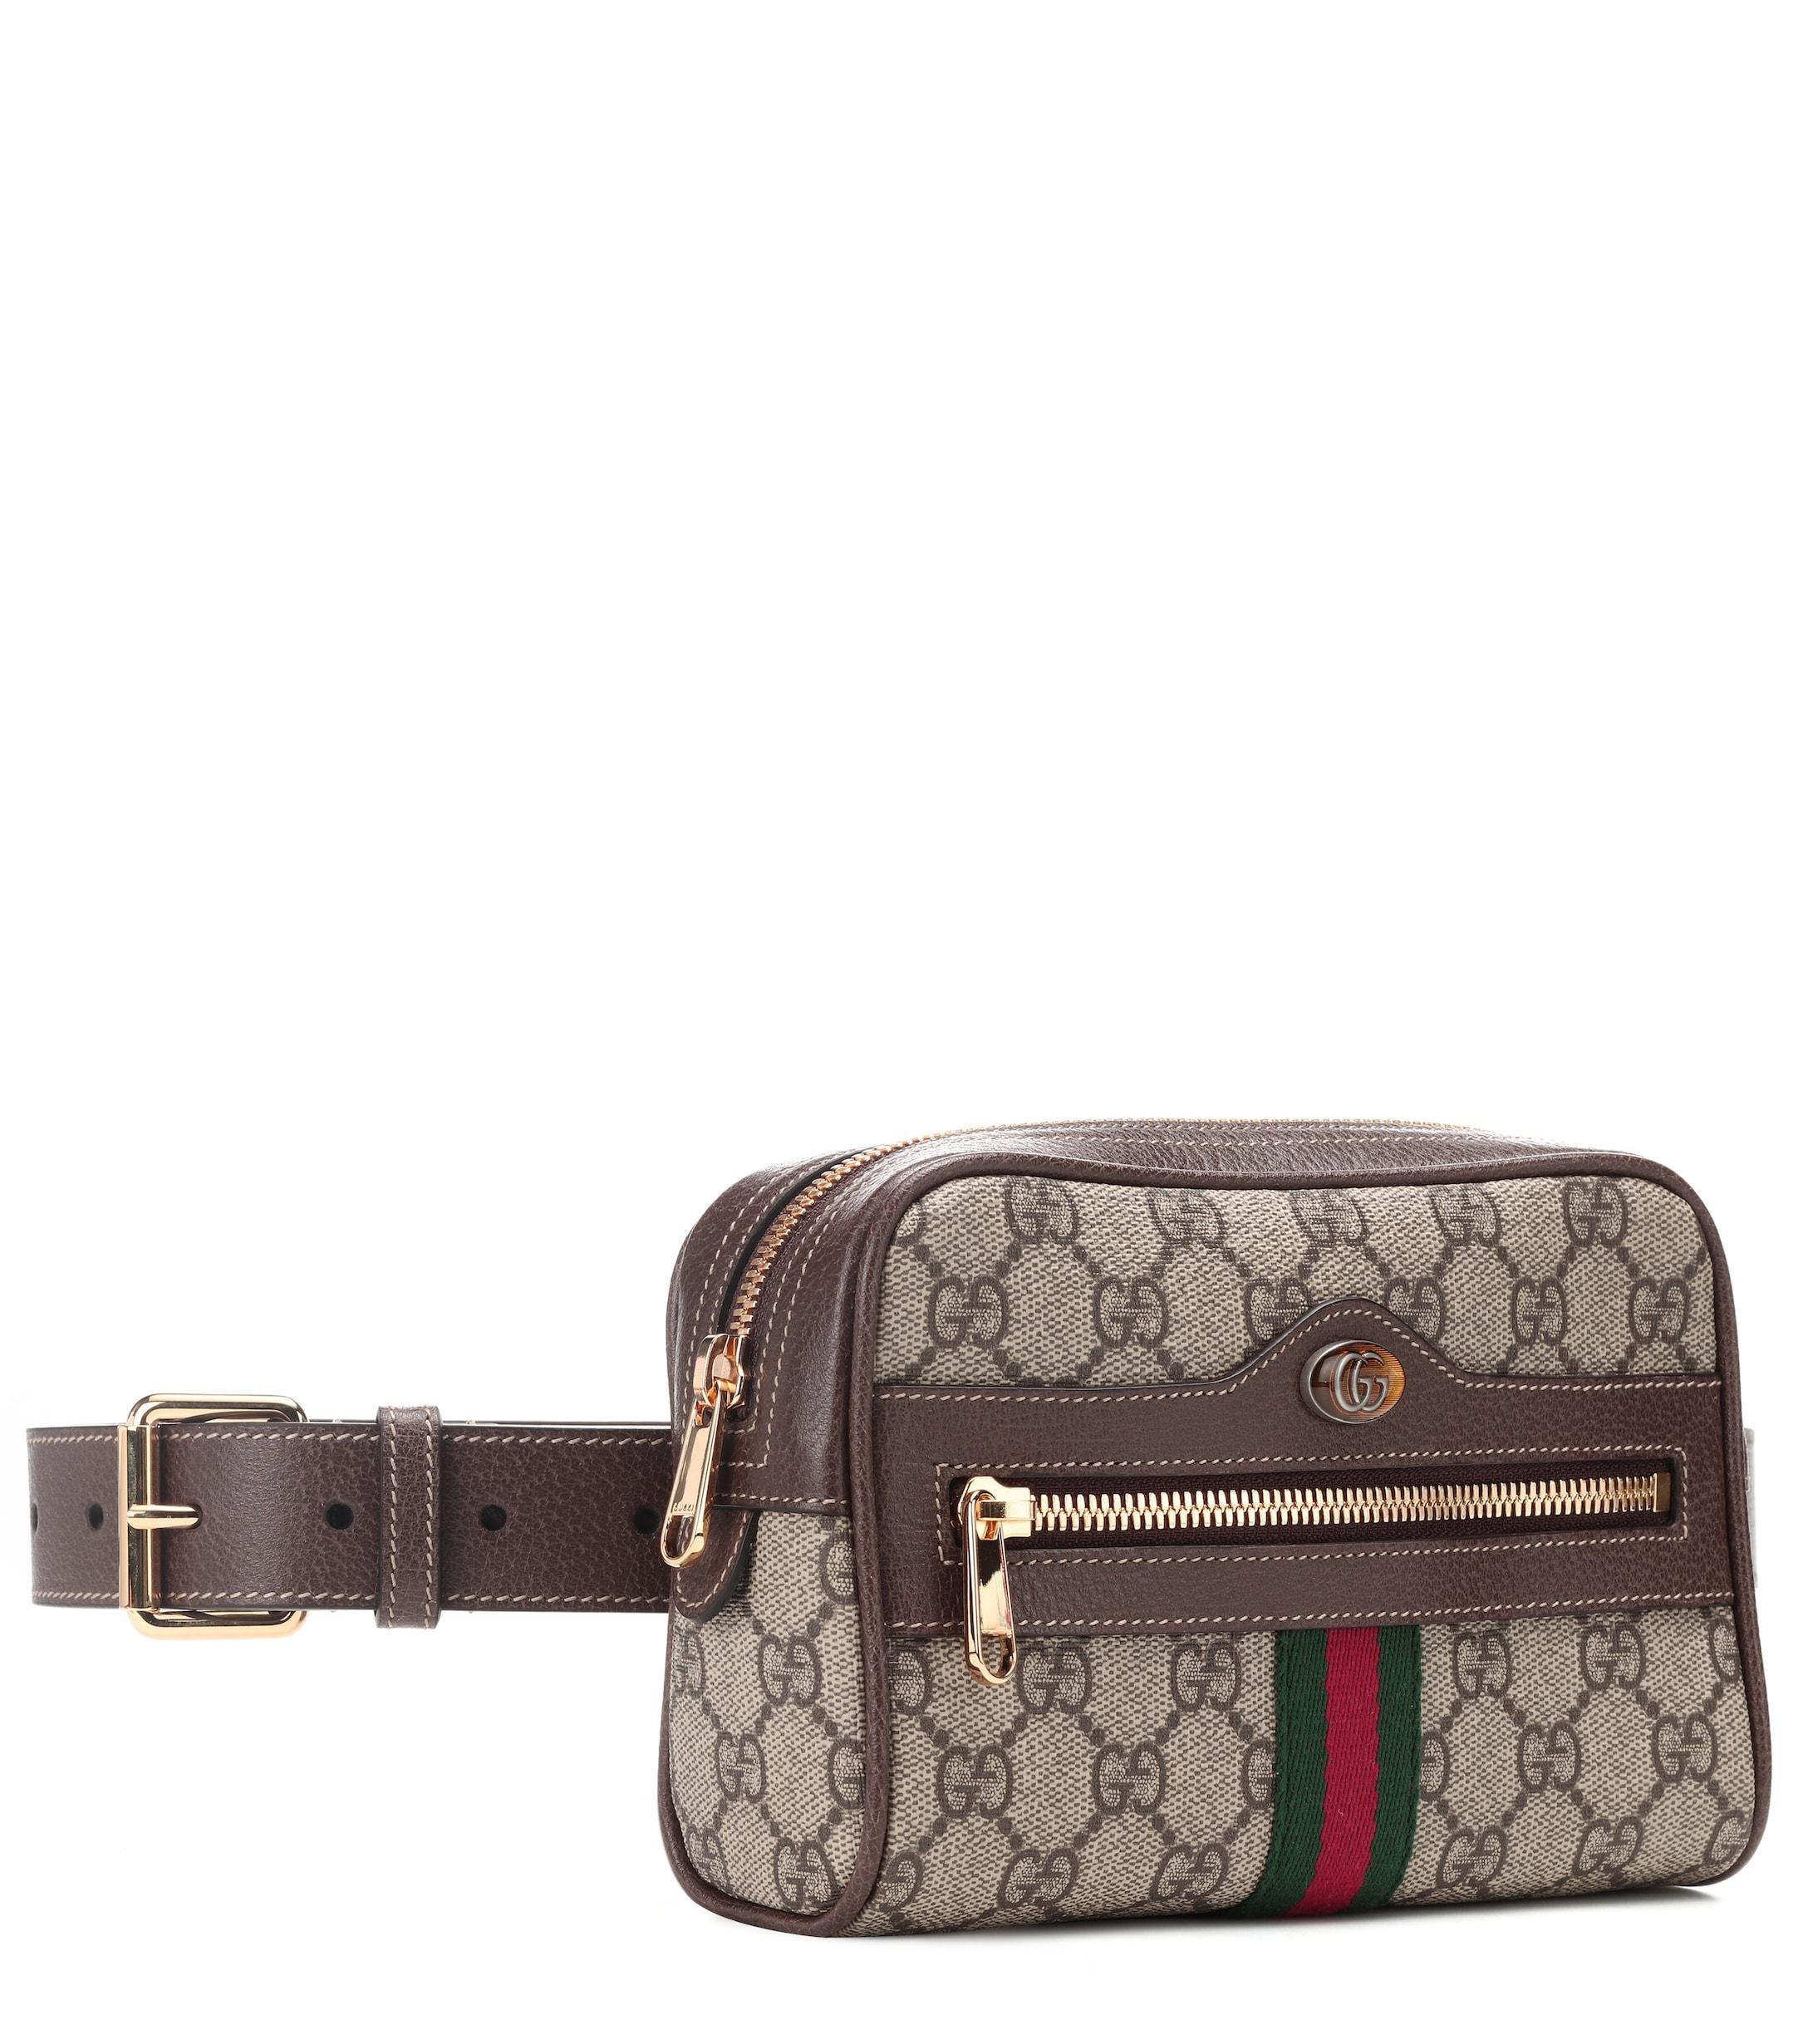 74e10295fbc7 Gucci Ophidia GG Supreme Small Belt Bag - Lyst